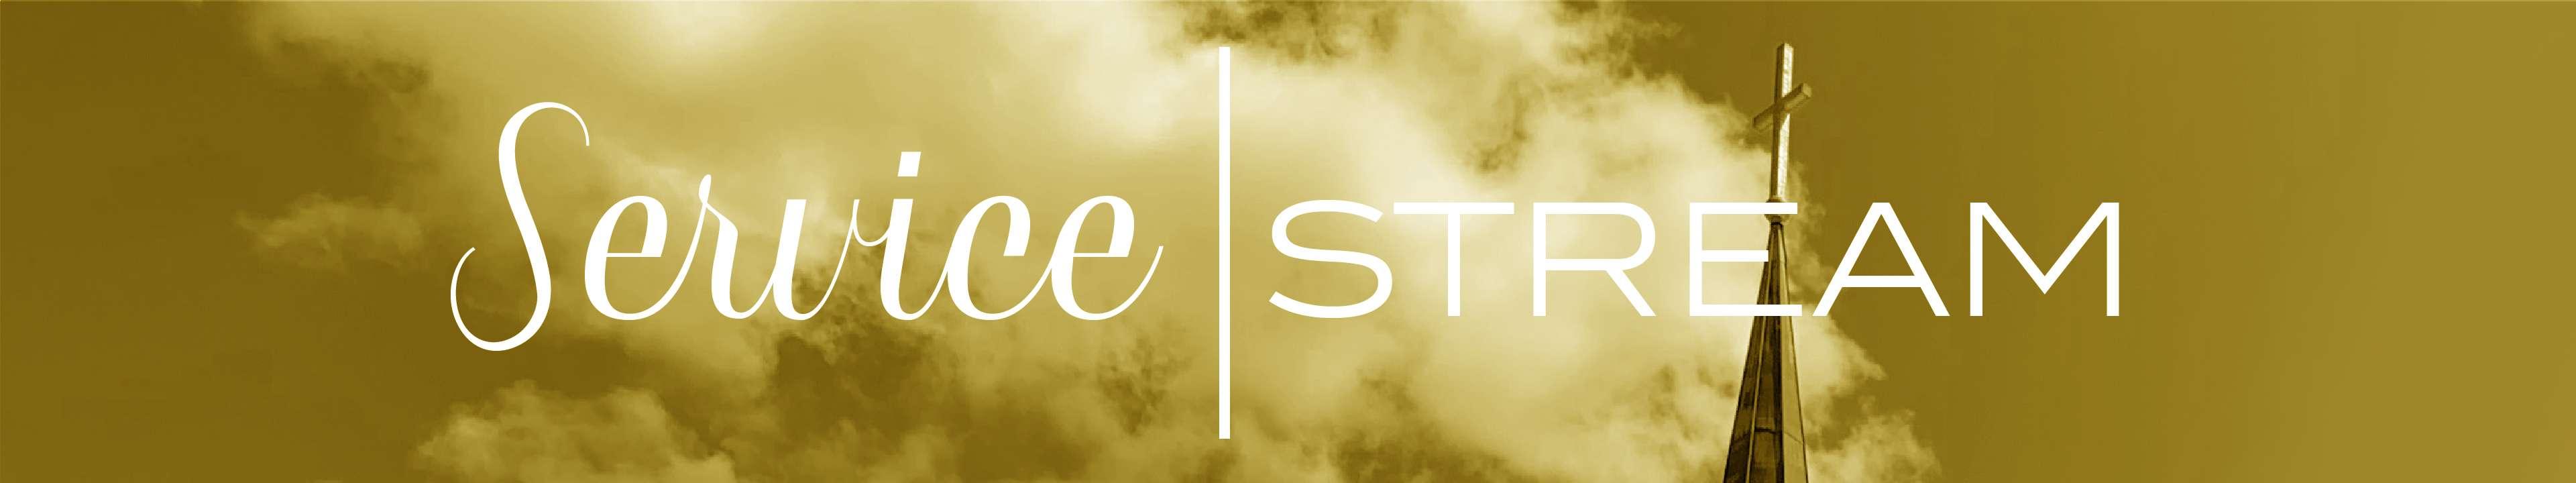 sermon-stream-10brd-dq2020-slim-banner